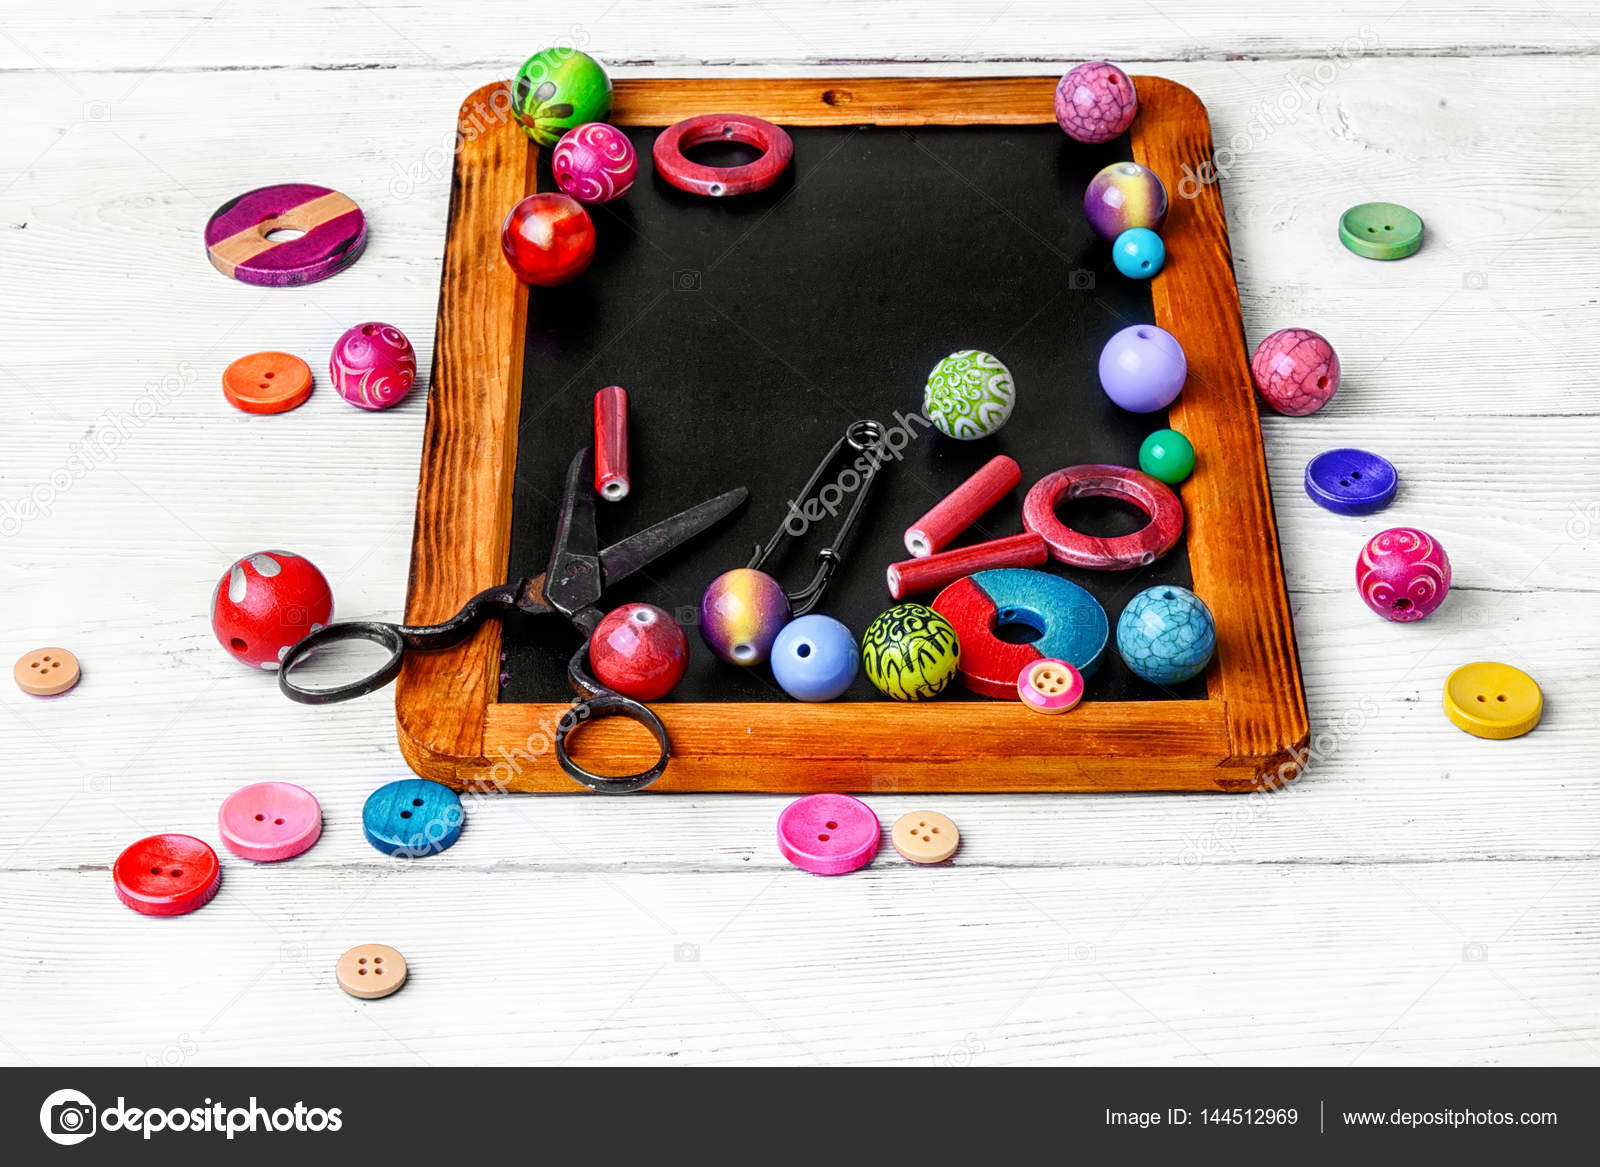 Beads For Art On The Chalk Board Stock Photo NikolayDonetsk - Pool table chalk board